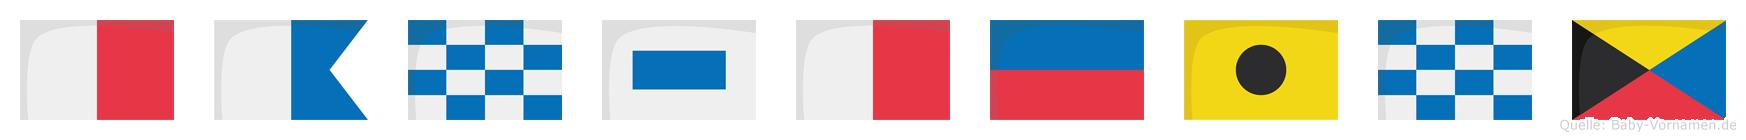 Hansheinz im Flaggenalphabet